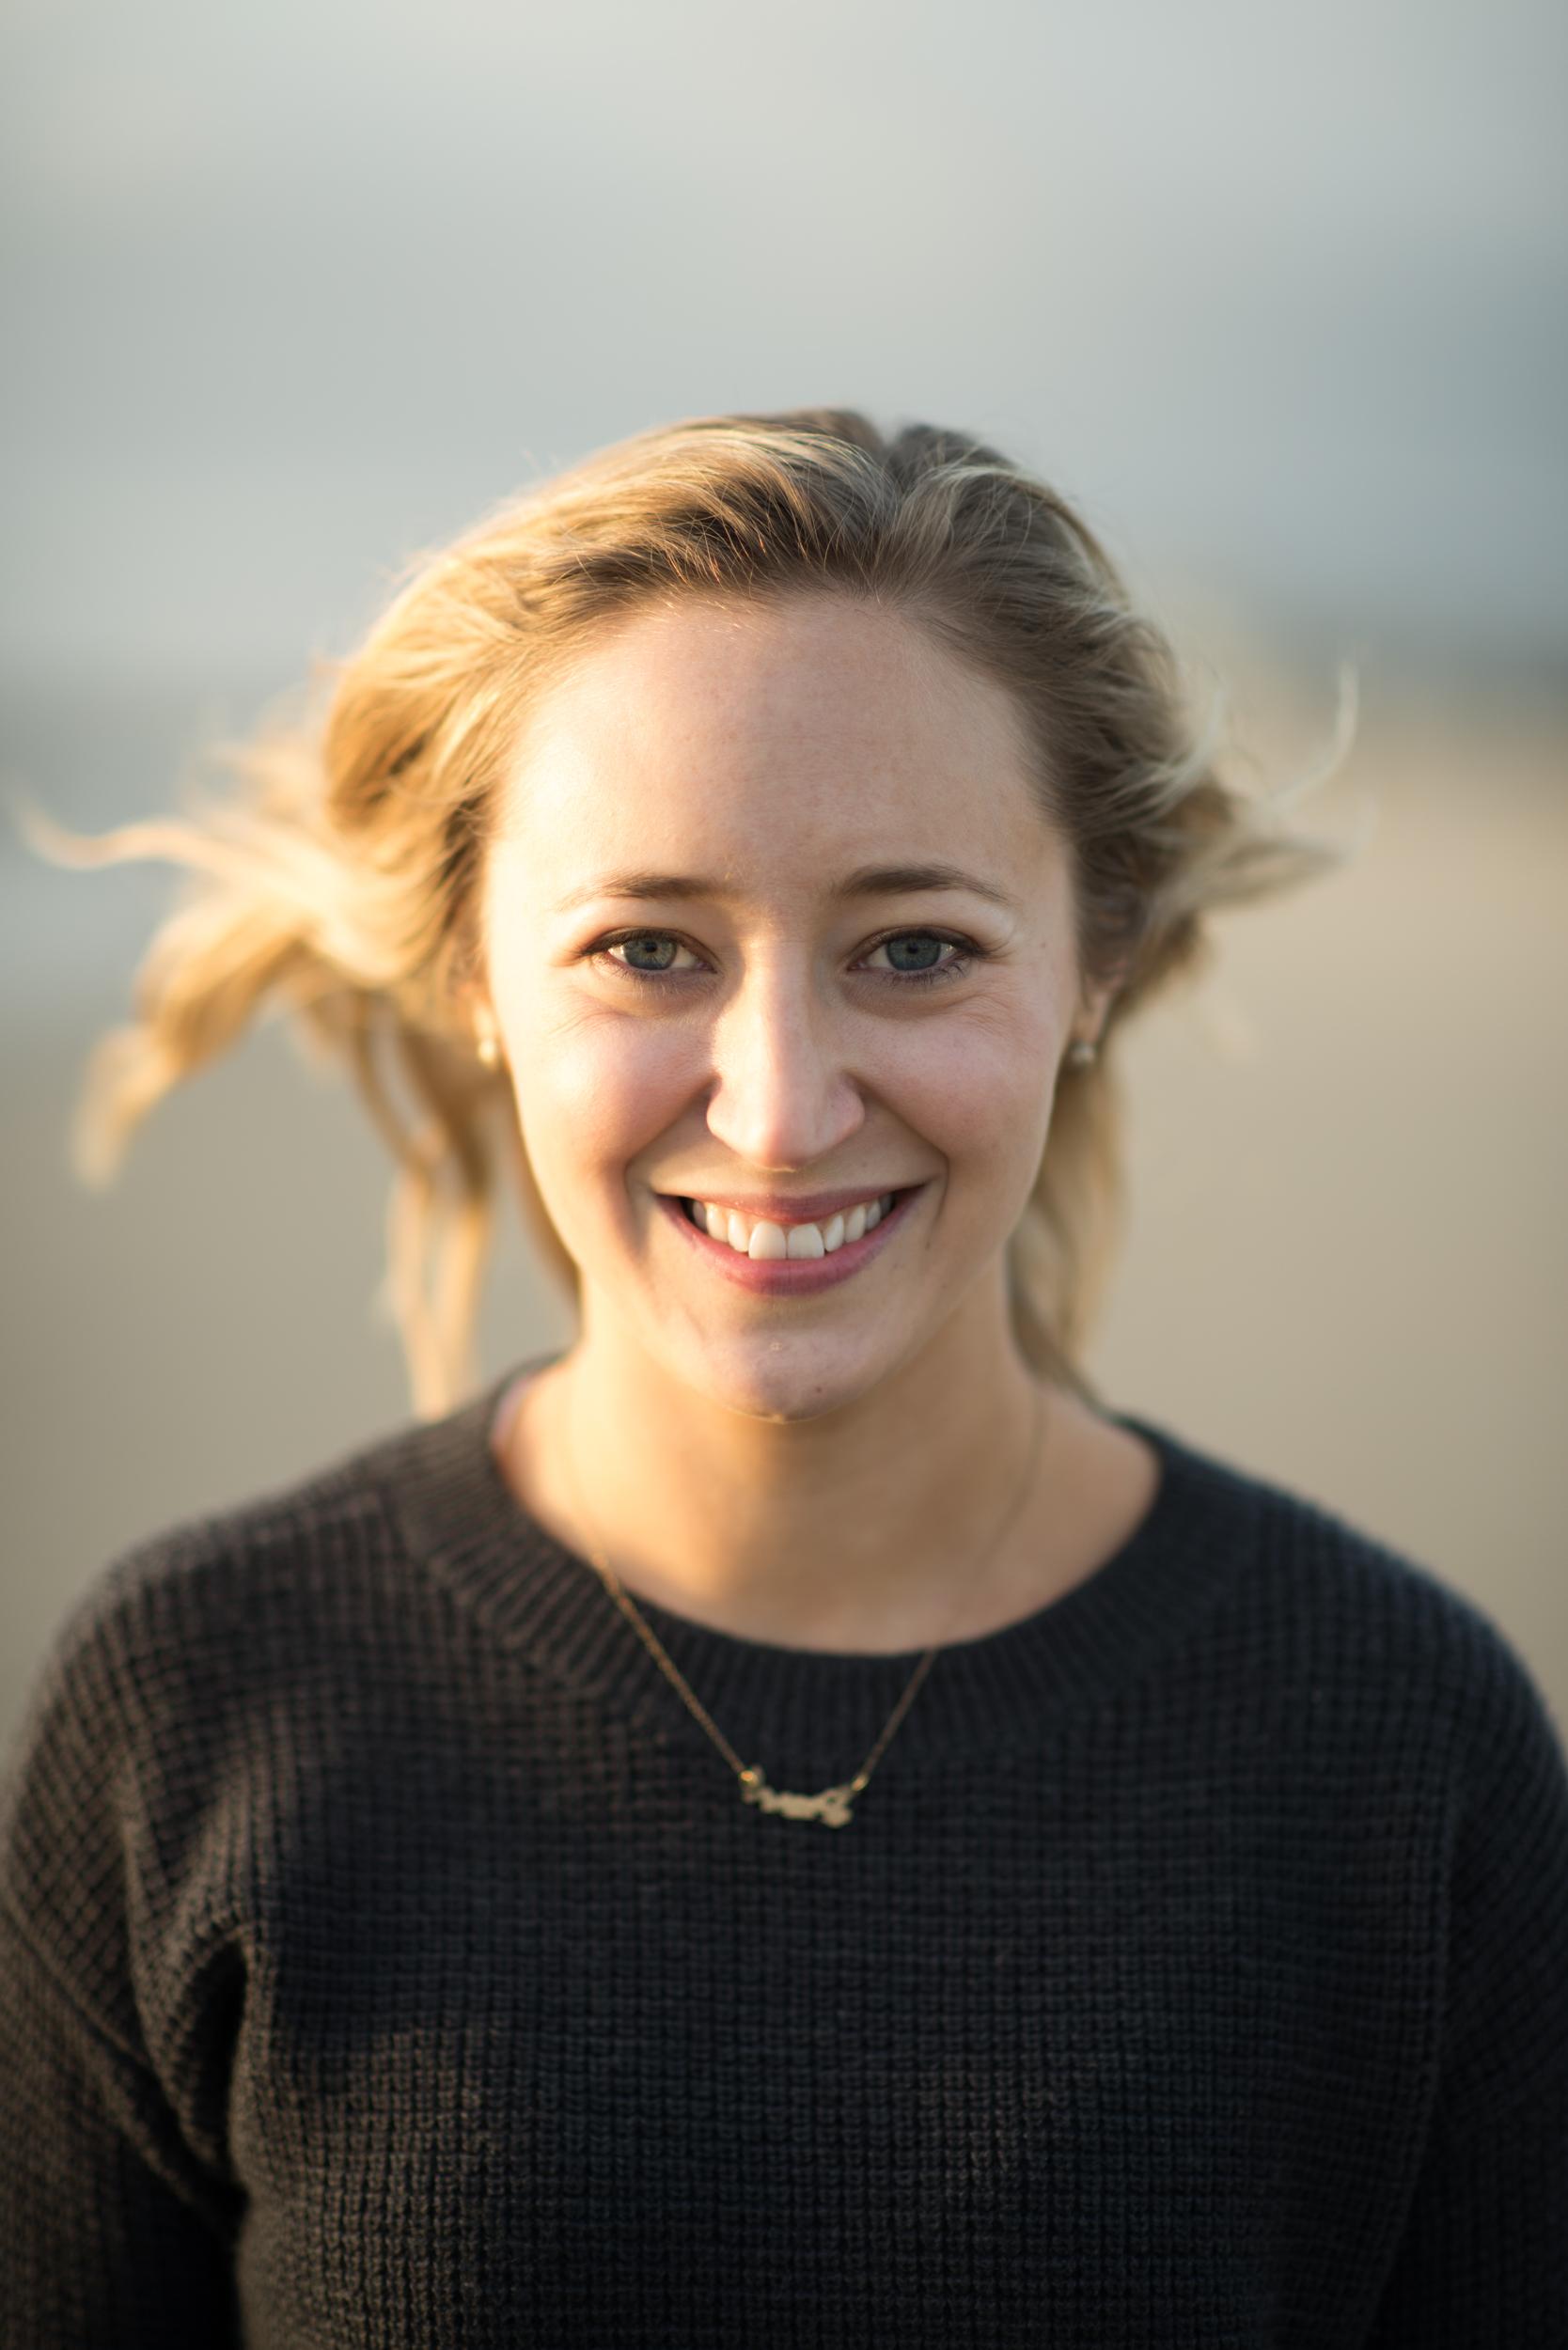 Kailea Switzer